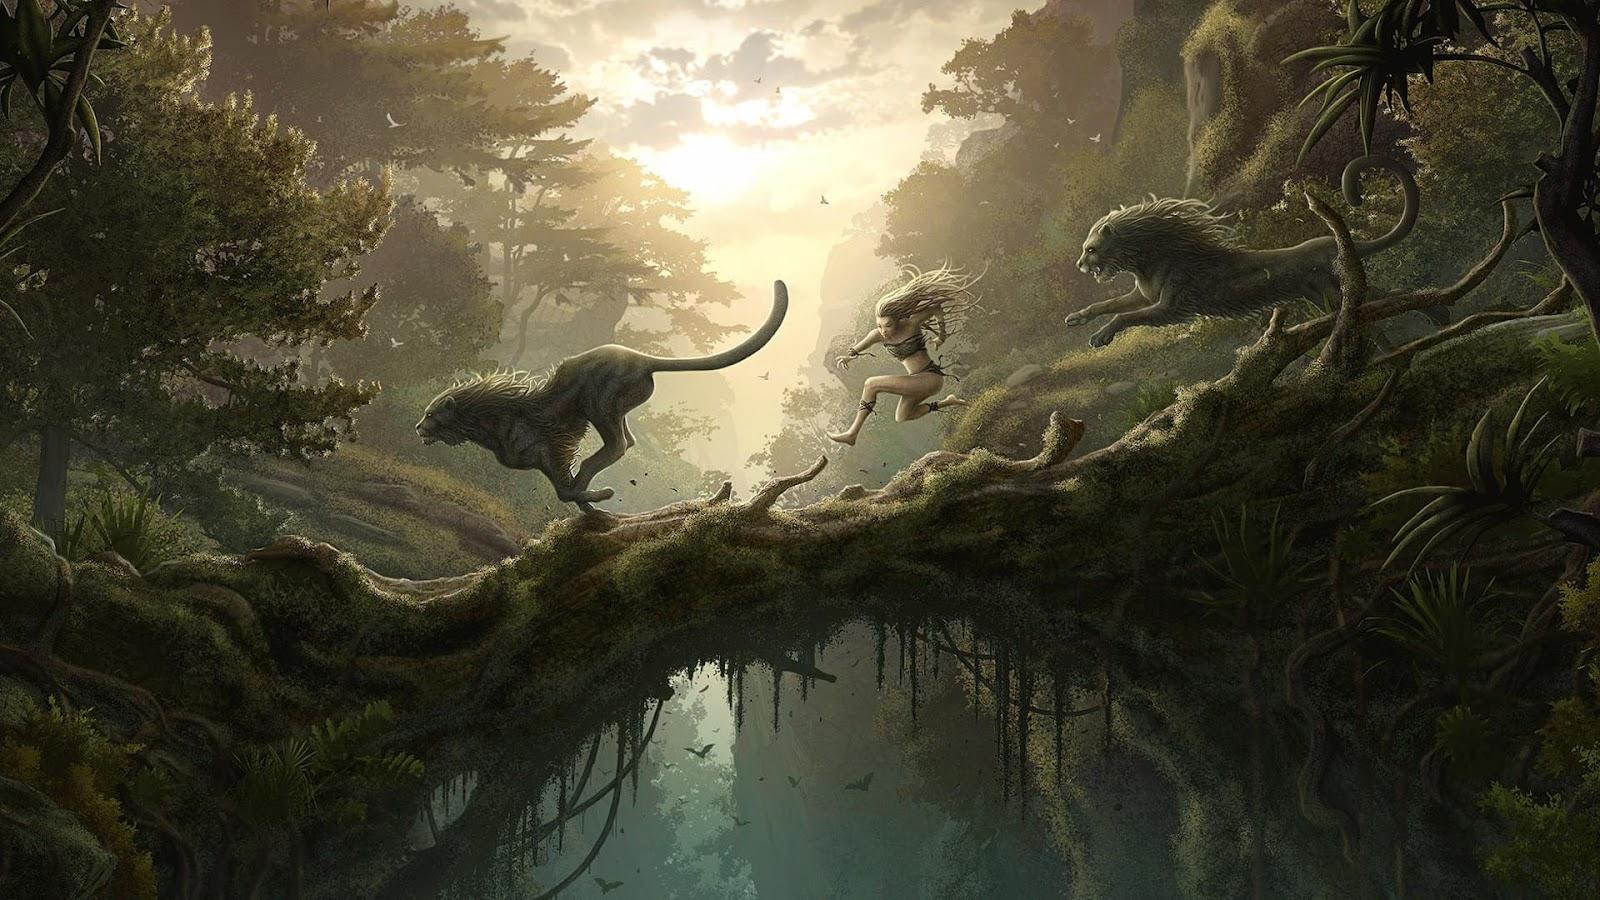 http://2.bp.blogspot.com/-XLM4xvQ1jn4/UDmmQK47ZzI/AAAAAAAABag/_n4eiUtCKmQ/s1600/dinosaurs-wallpaper-5.jpg